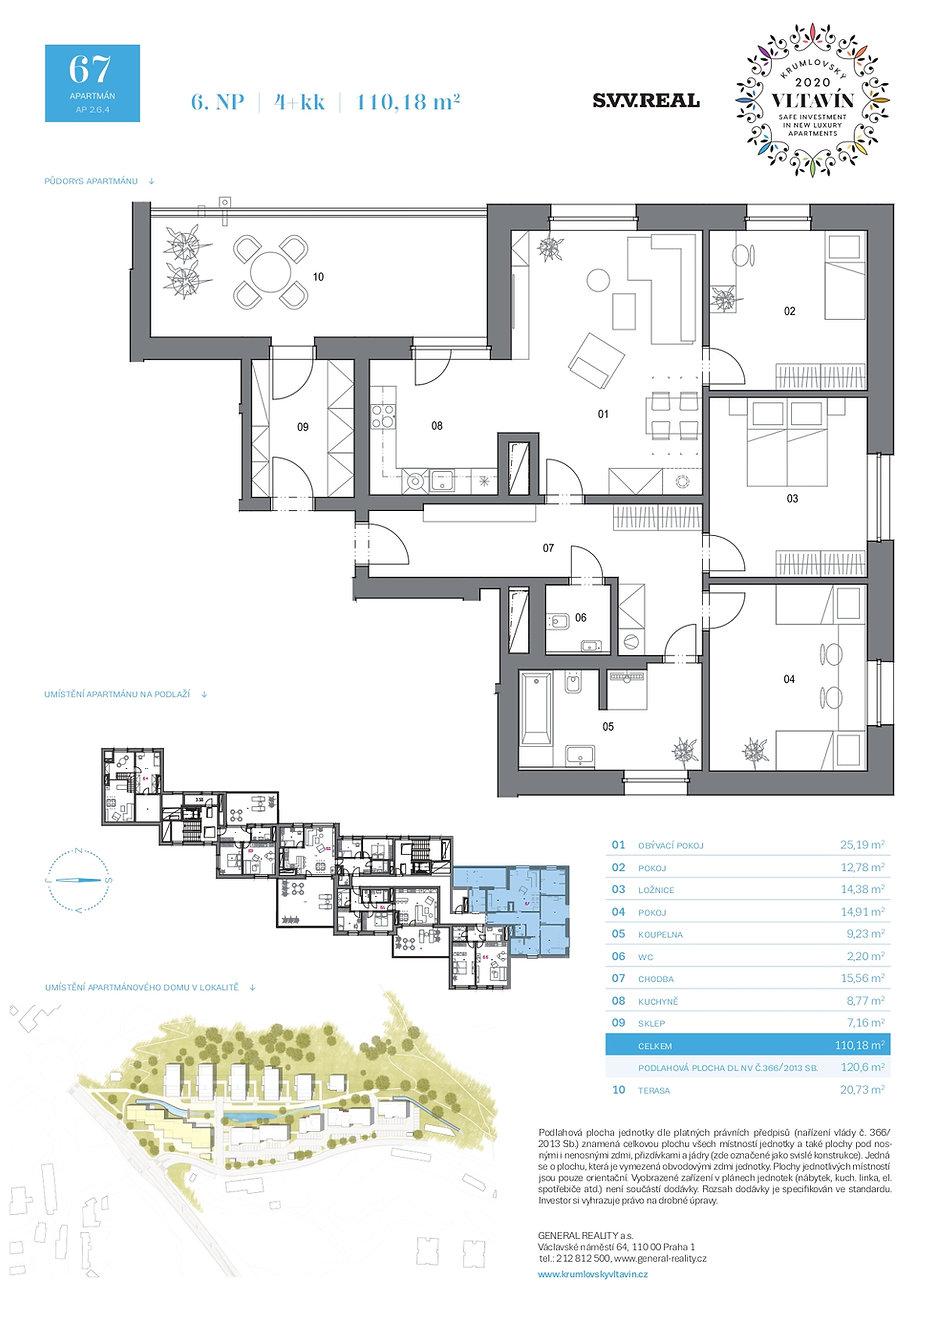 GR_krumlovsky-vltavin_bytove-karty-apartmany_6NP_A67_page-0001.jpg